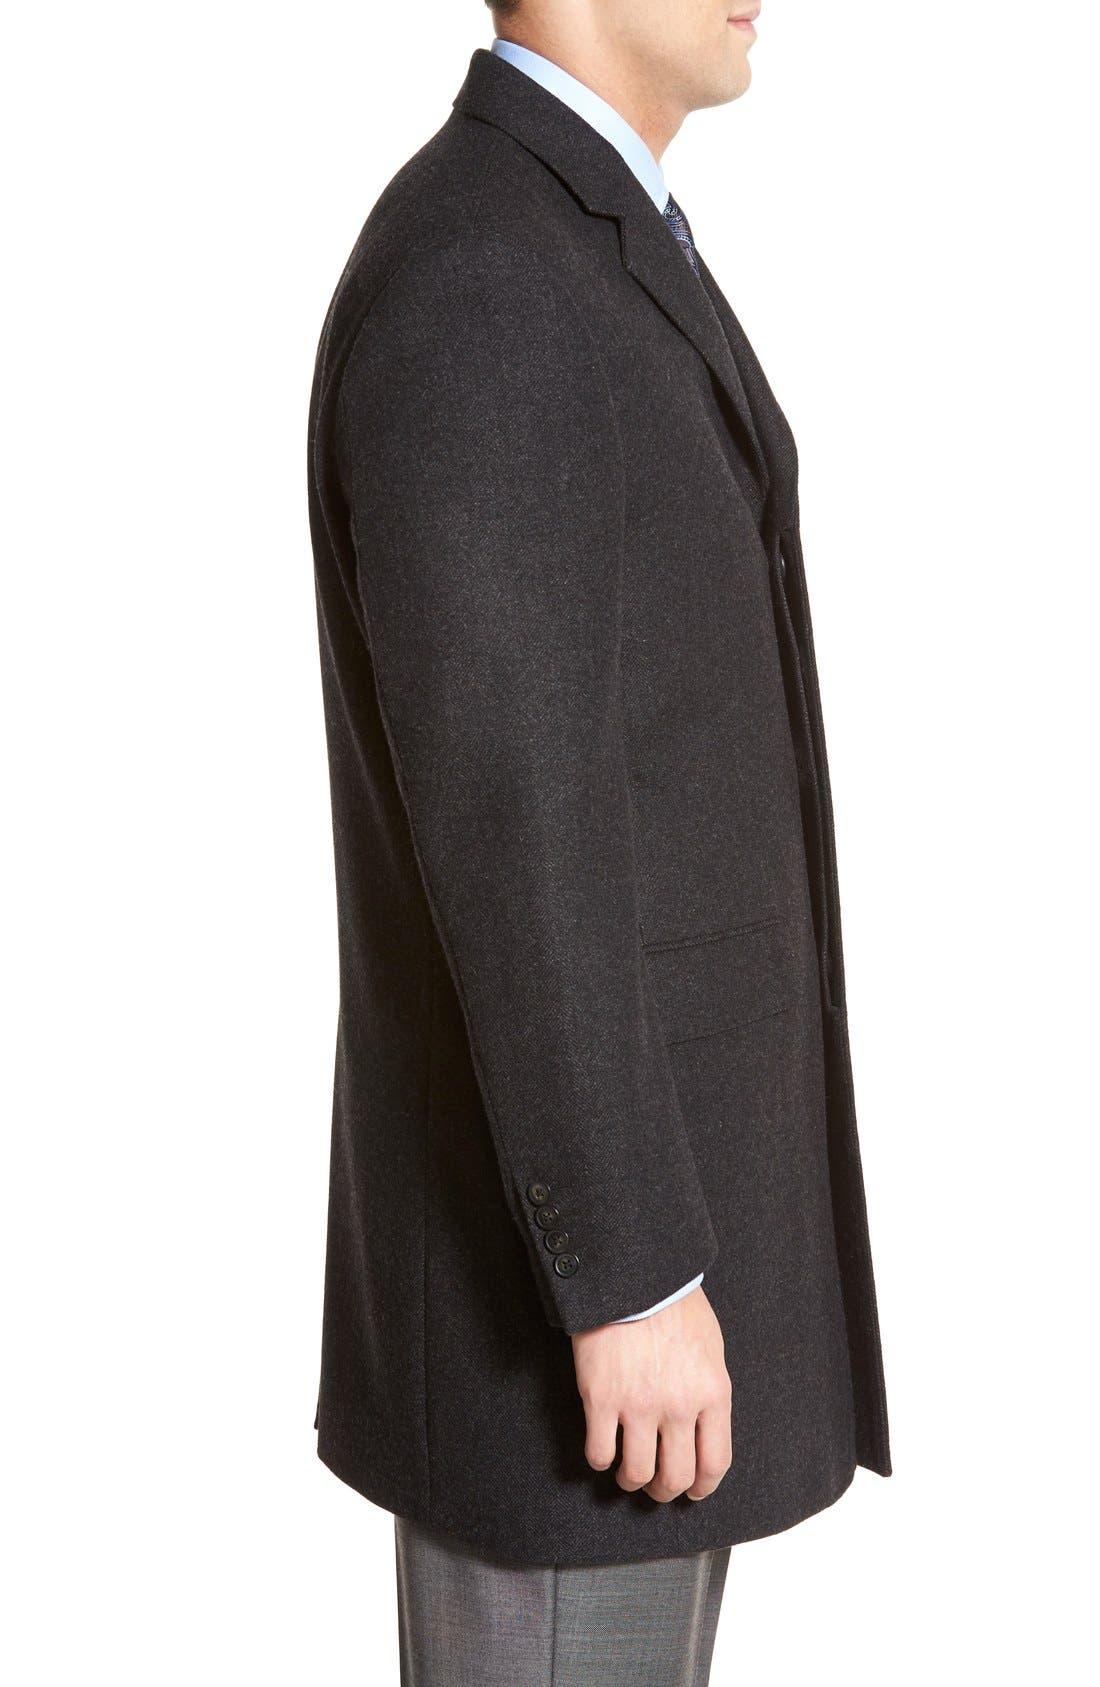 Maitland Modern Fit Wool Blend Overcoat,                             Alternate thumbnail 4, color,                             035